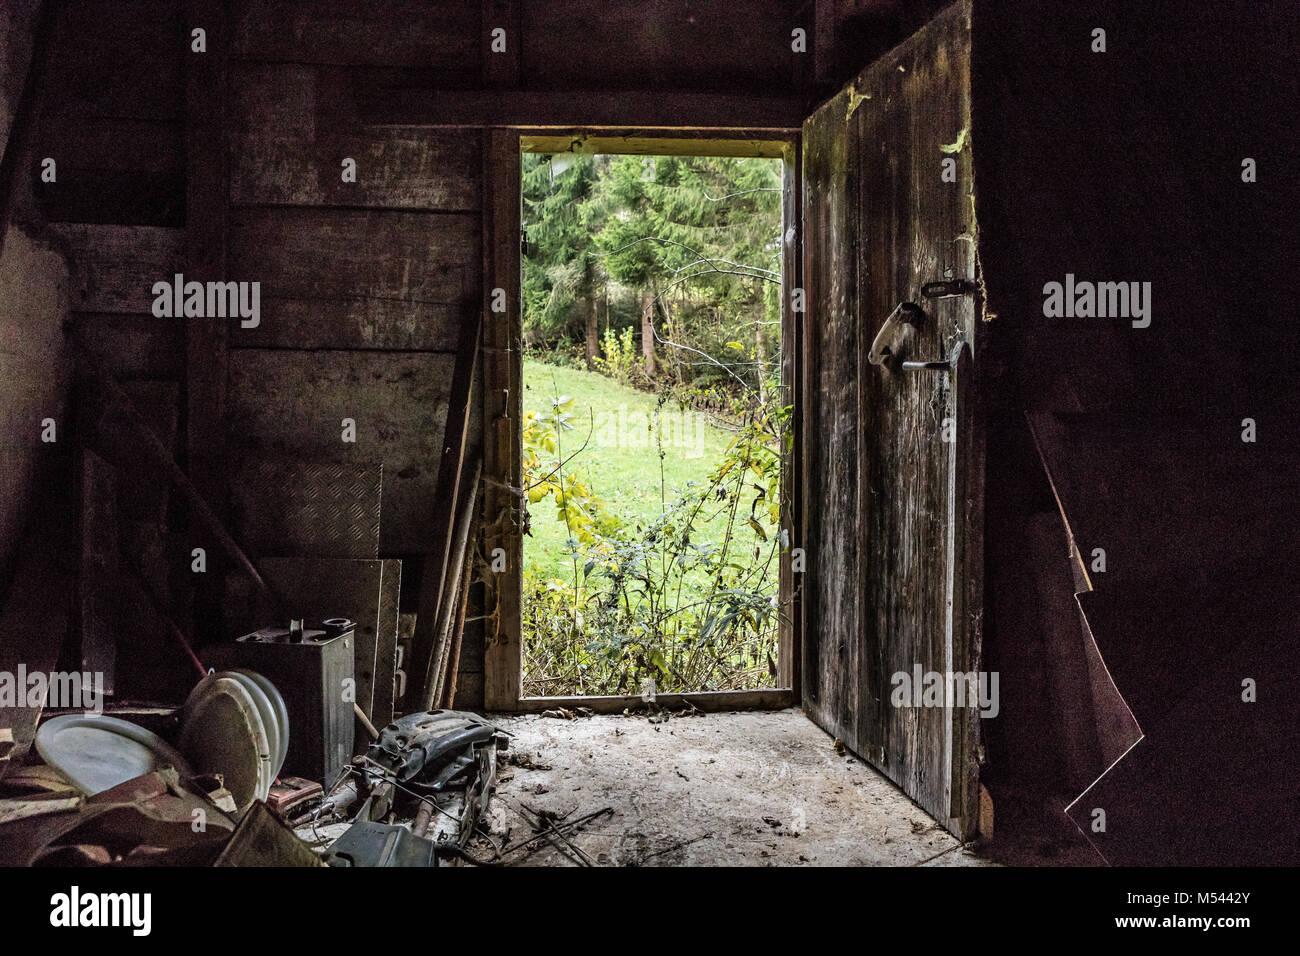 Alte Holztür an einem verlassenen Haus - verlorene Ort Stockbild